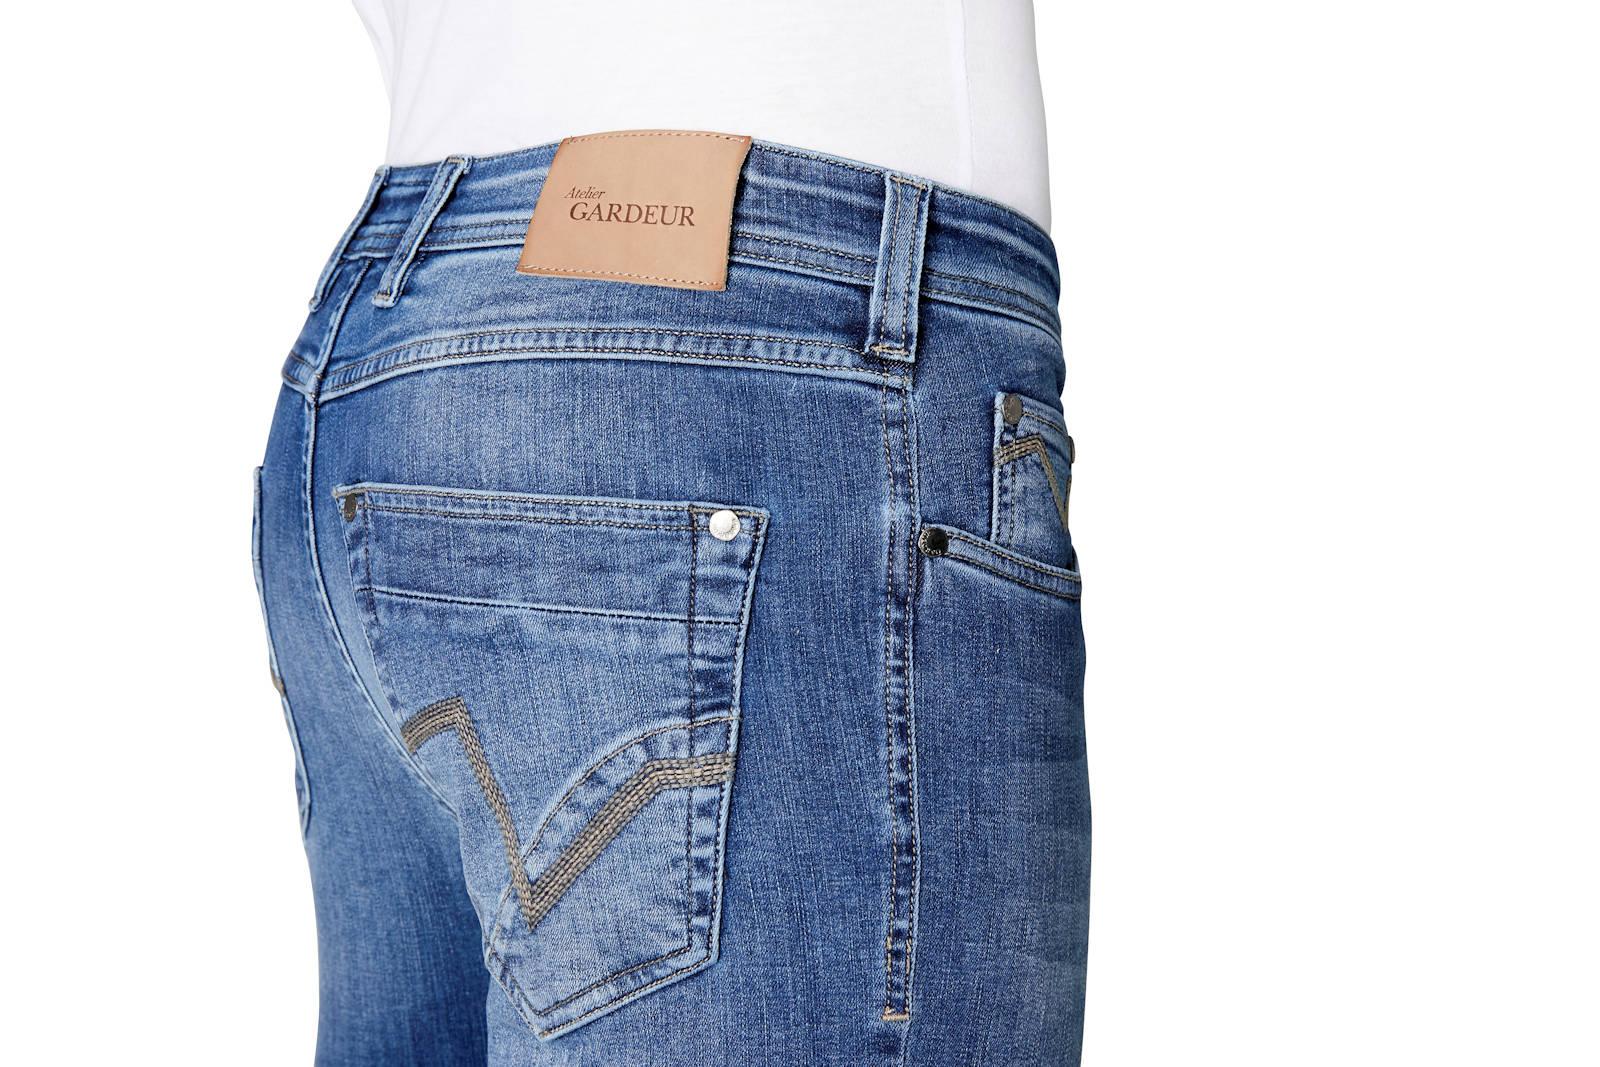 Atelier-GARDEUR-Jeans-BILL-8-Modern-Fit-Herren-Hose-Slim-Leg-Denim-NEU Indexbild 5